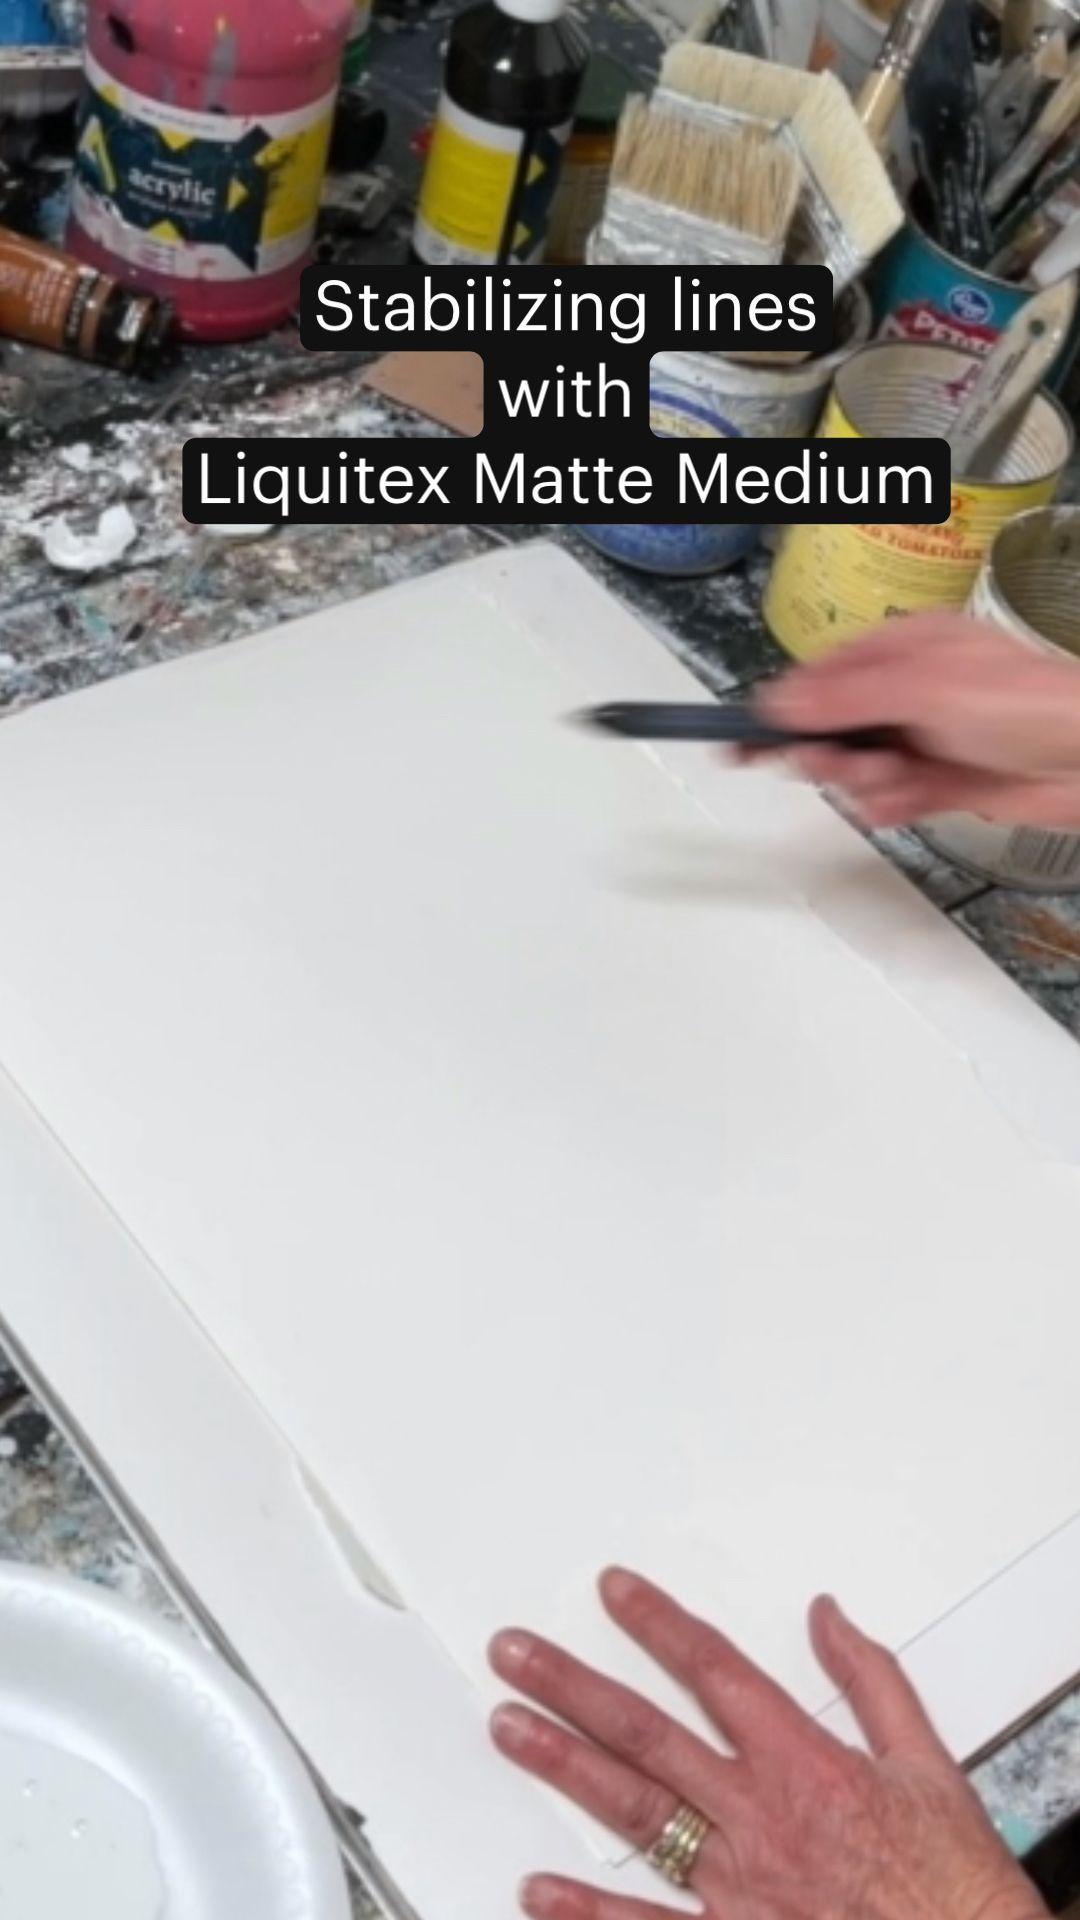 Stabilizing lines with Liquitex Matte Medium   Art Tips